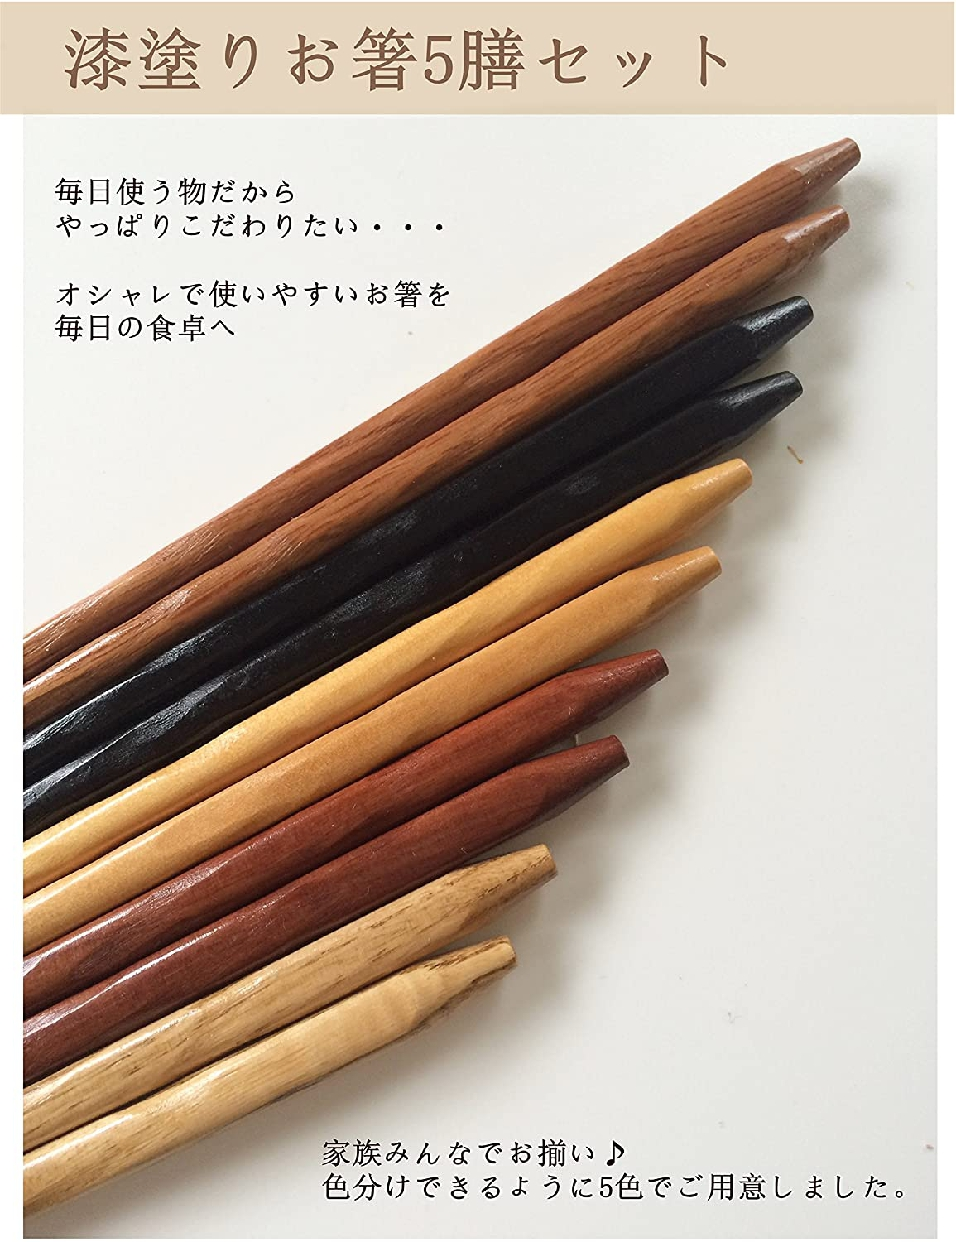 tawatawa(タワタワ) お箸 5膳セットの商品画像2